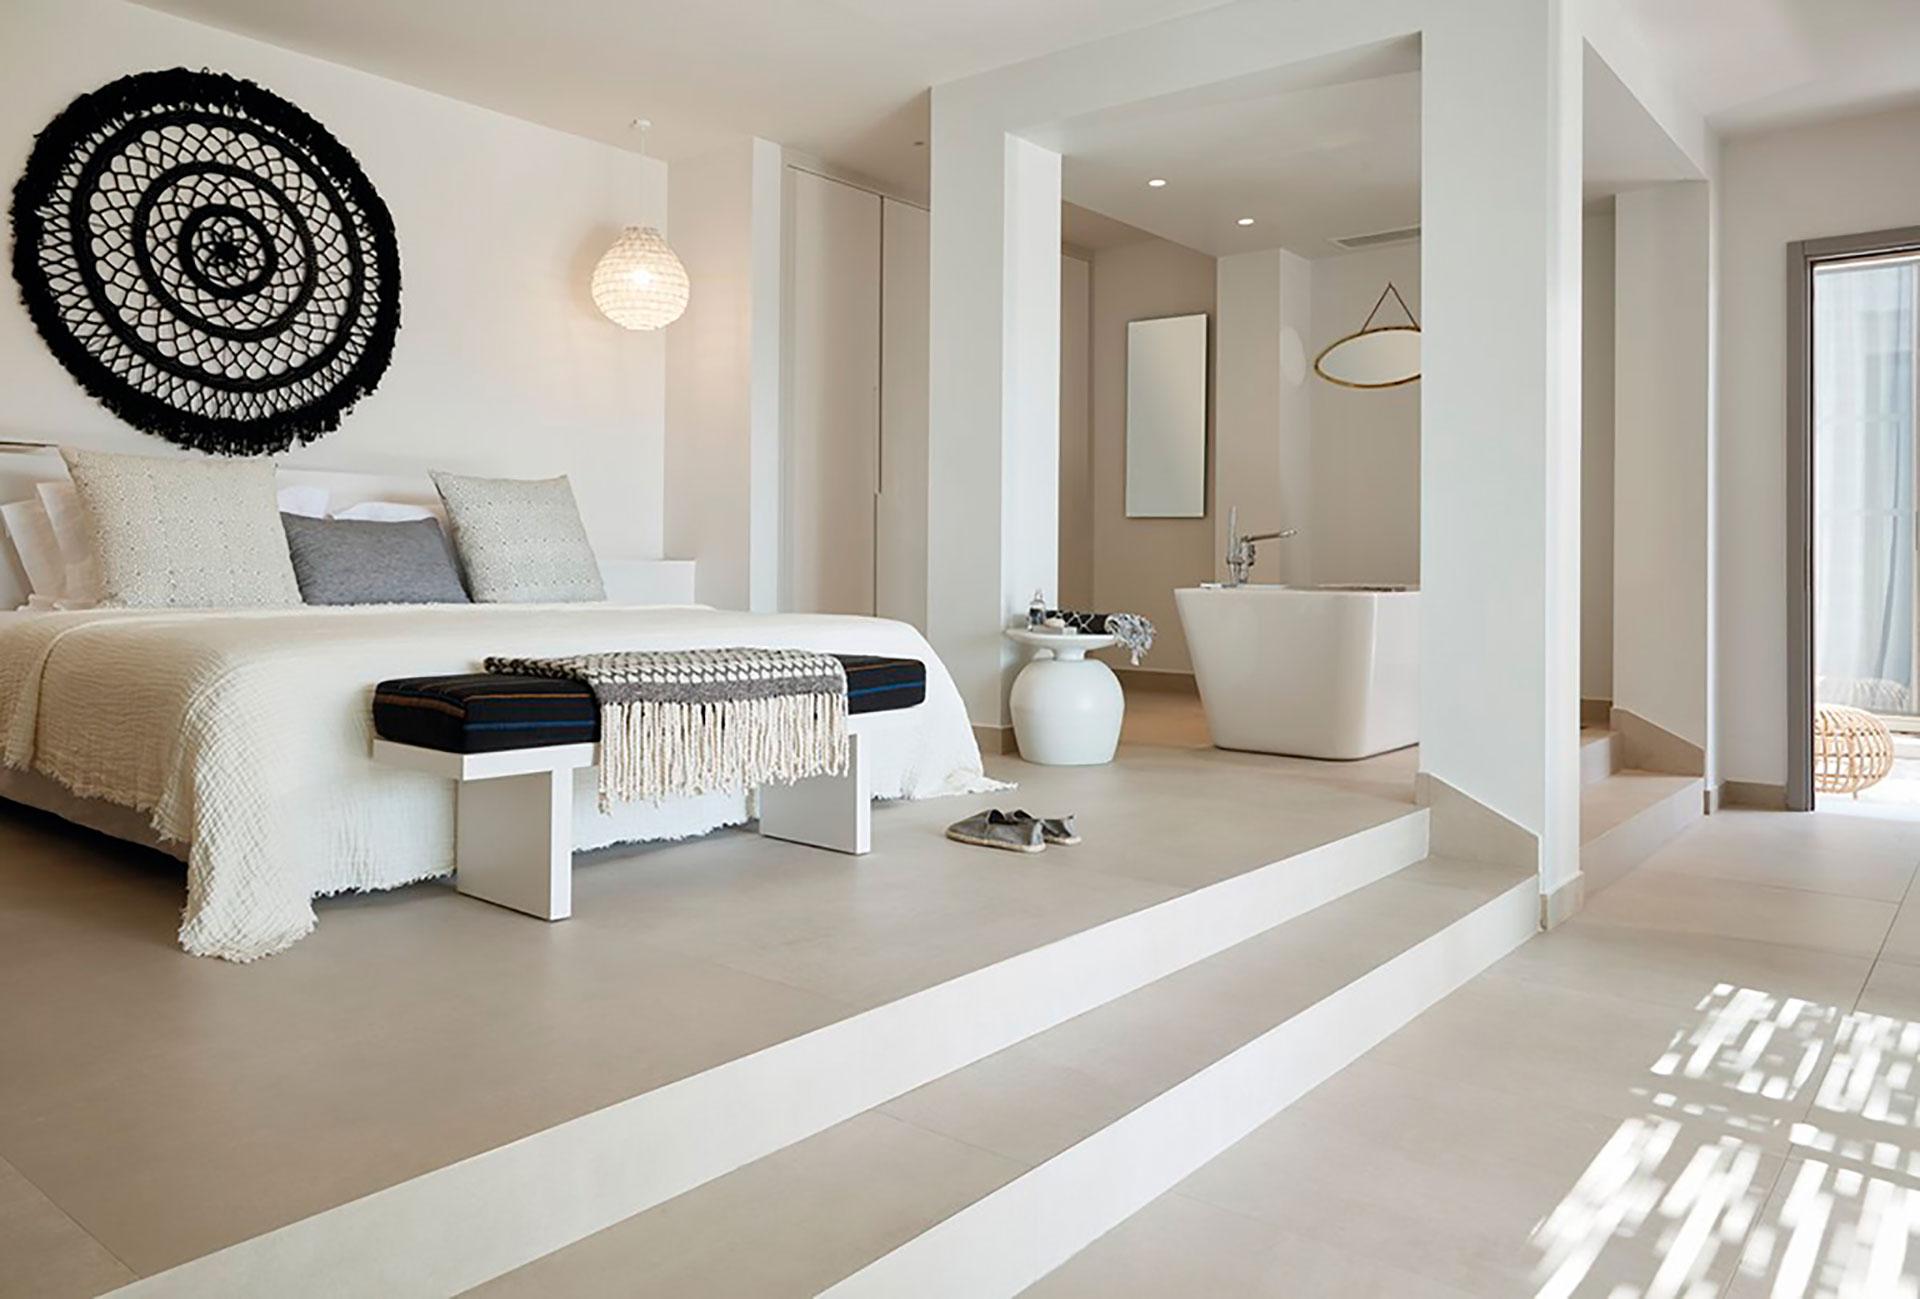 Foto Di Ville Lussuose ultra ariostea: pavimenti e rivestimenti di hotel di lusso e